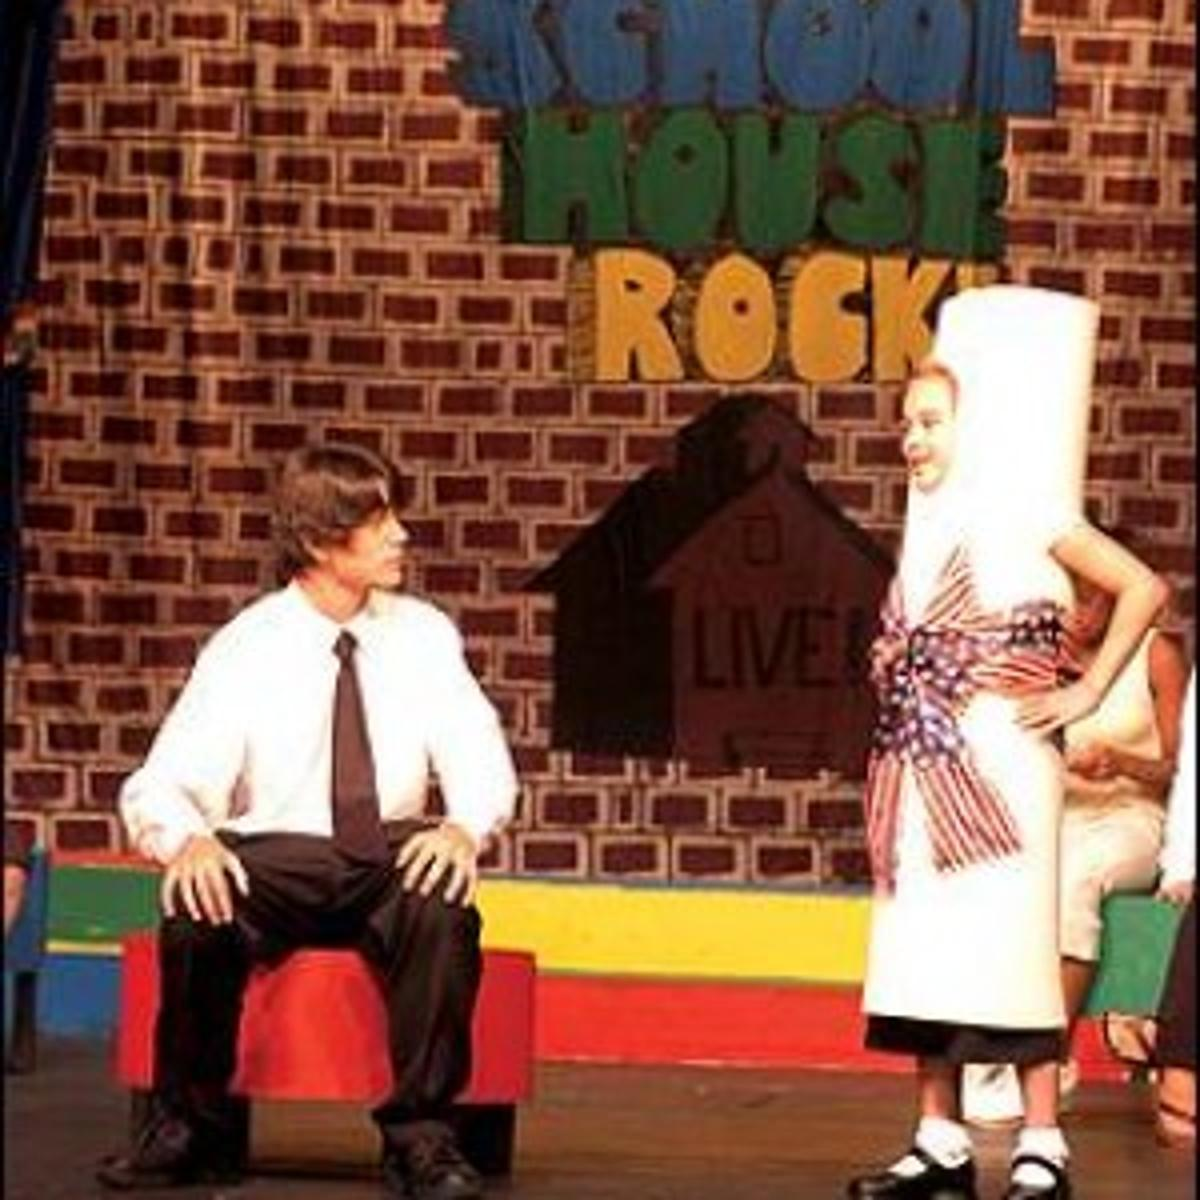 School House Rock Live! Junior play — Friday, Saturday